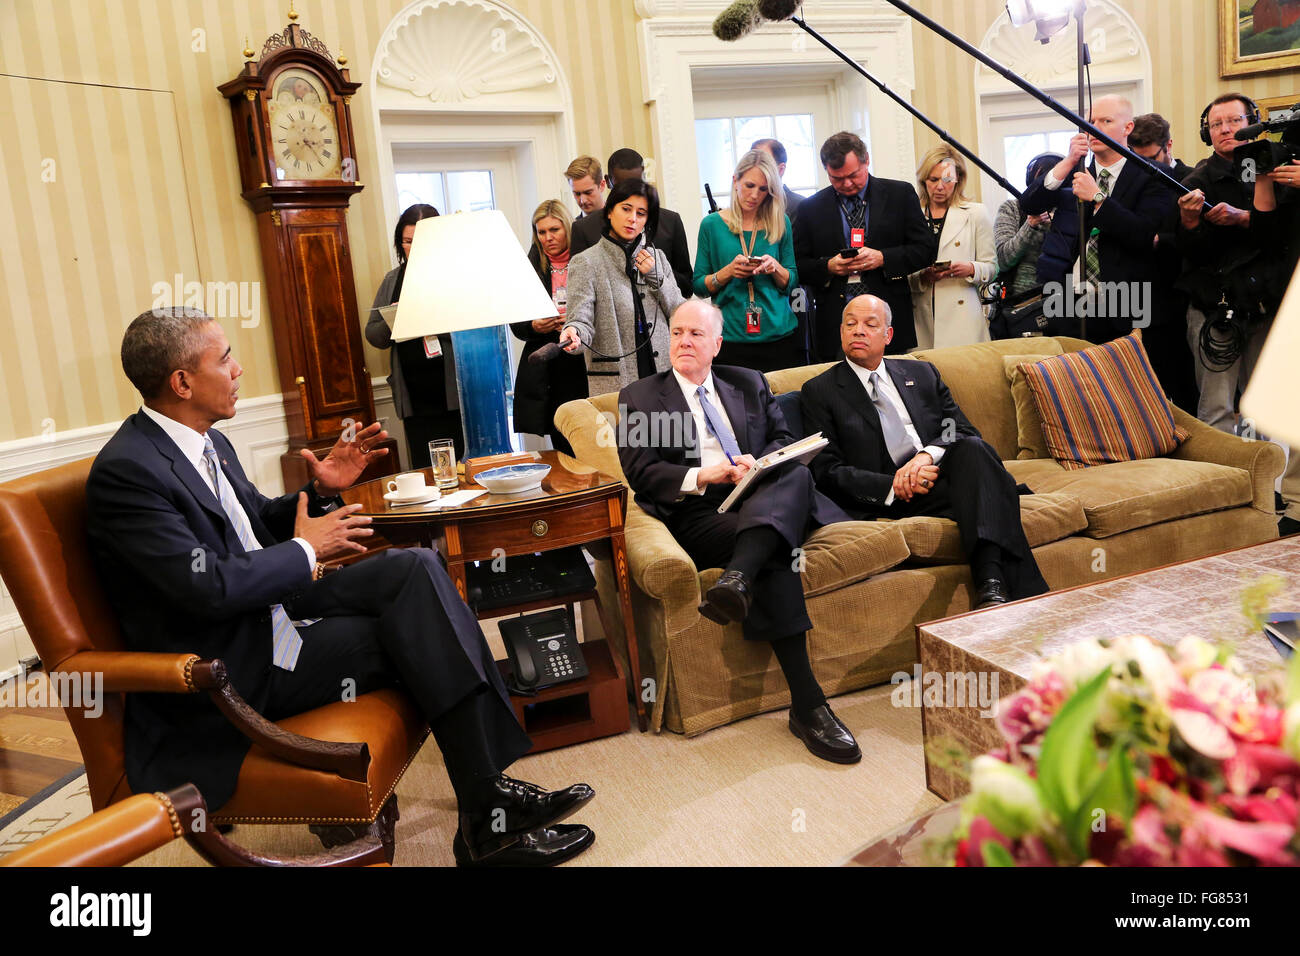 United States President Barack Obama meets with former National Security Advisor Tom Donilon (C) and former IBM - Stock Image